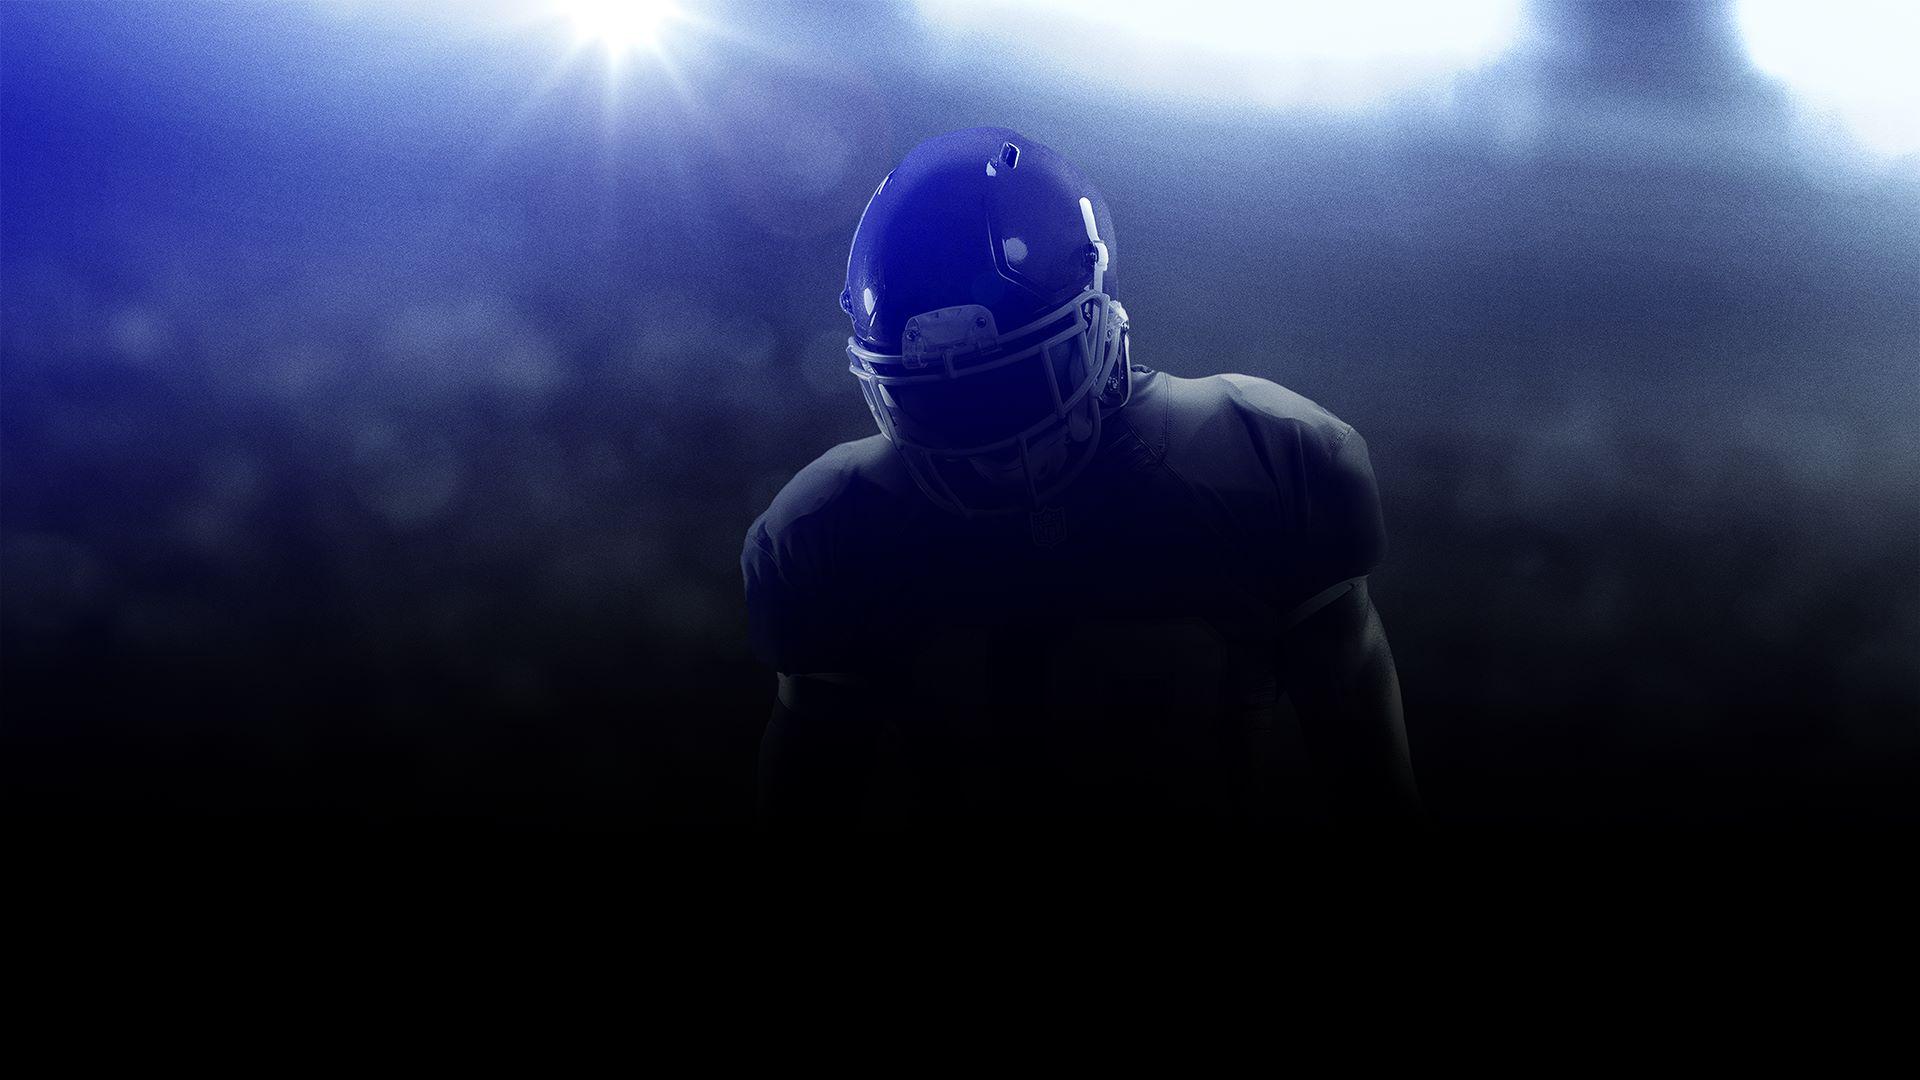 f4d0201b46 Comprar Oferta por reservar Madden NFL 19  Microsoft Store es-MX